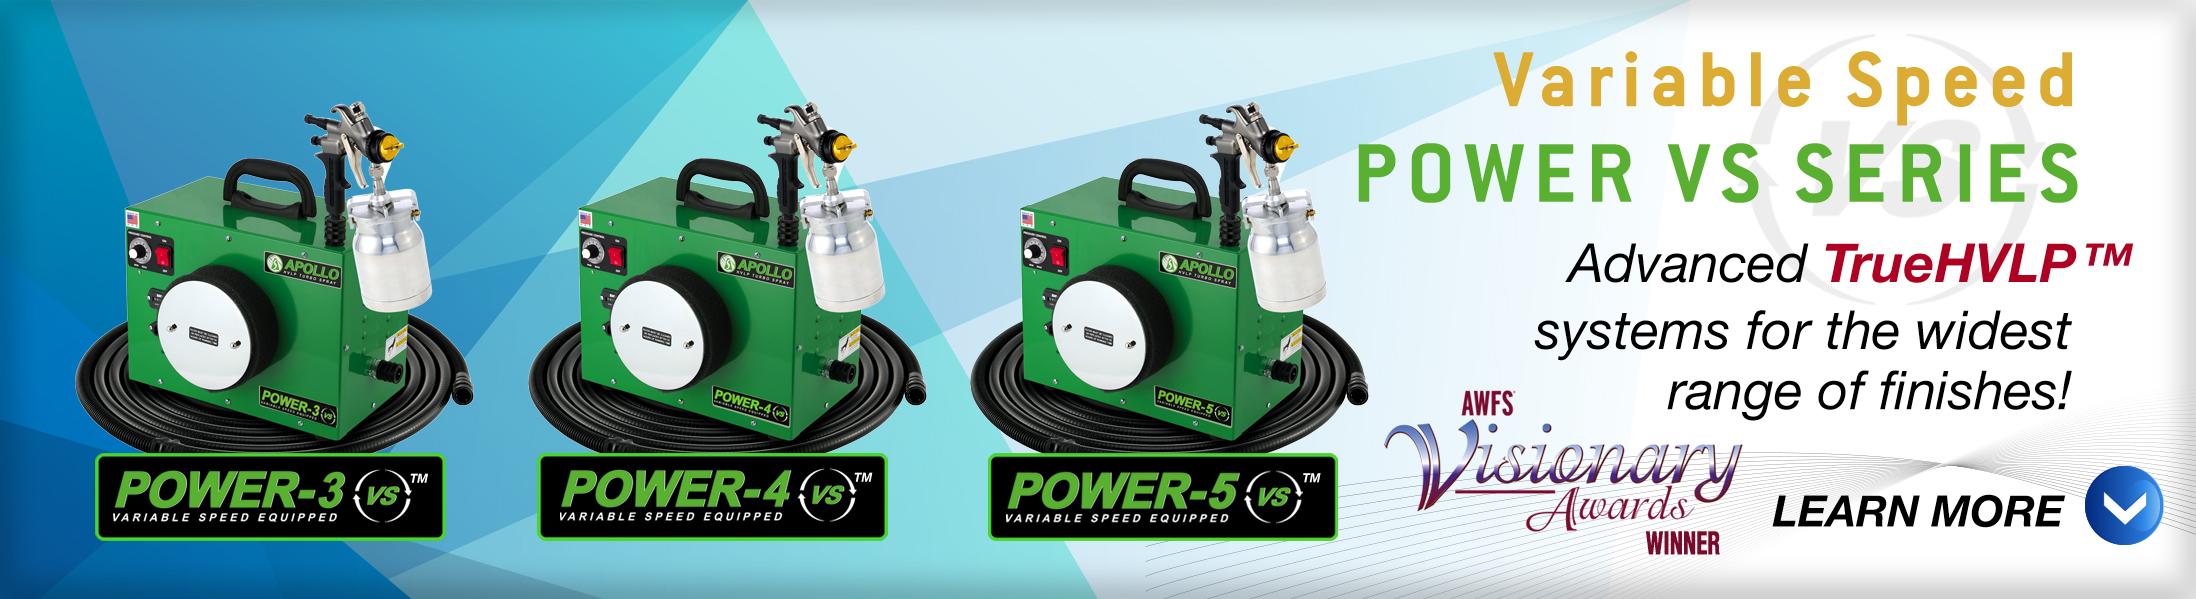 Power VS Series